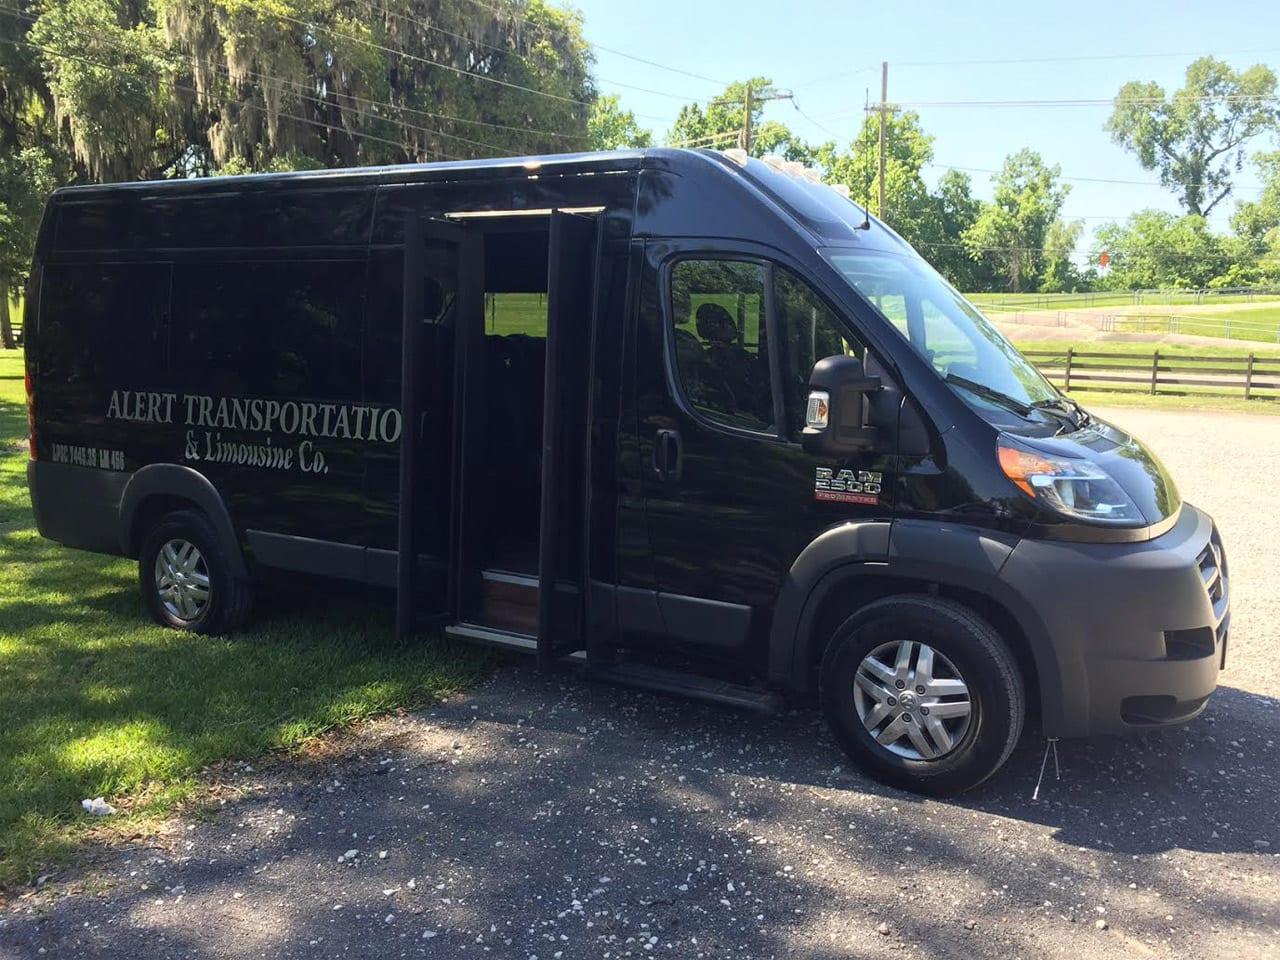 Black Ram Executive Van Alert Transportation Of New Orleans